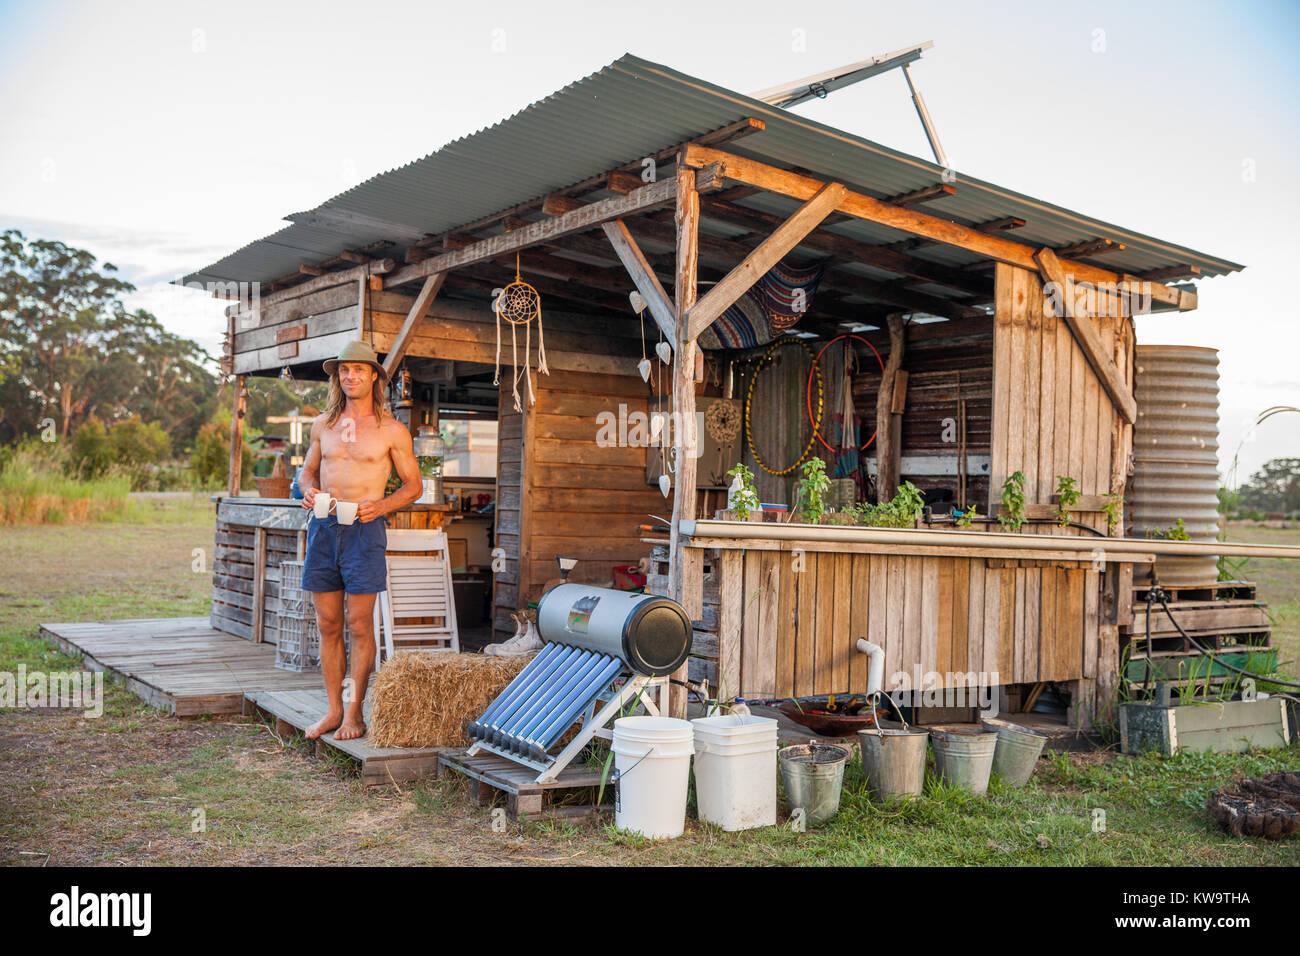 Man outside Off grid shack or shed in Australian bush - Stock Image